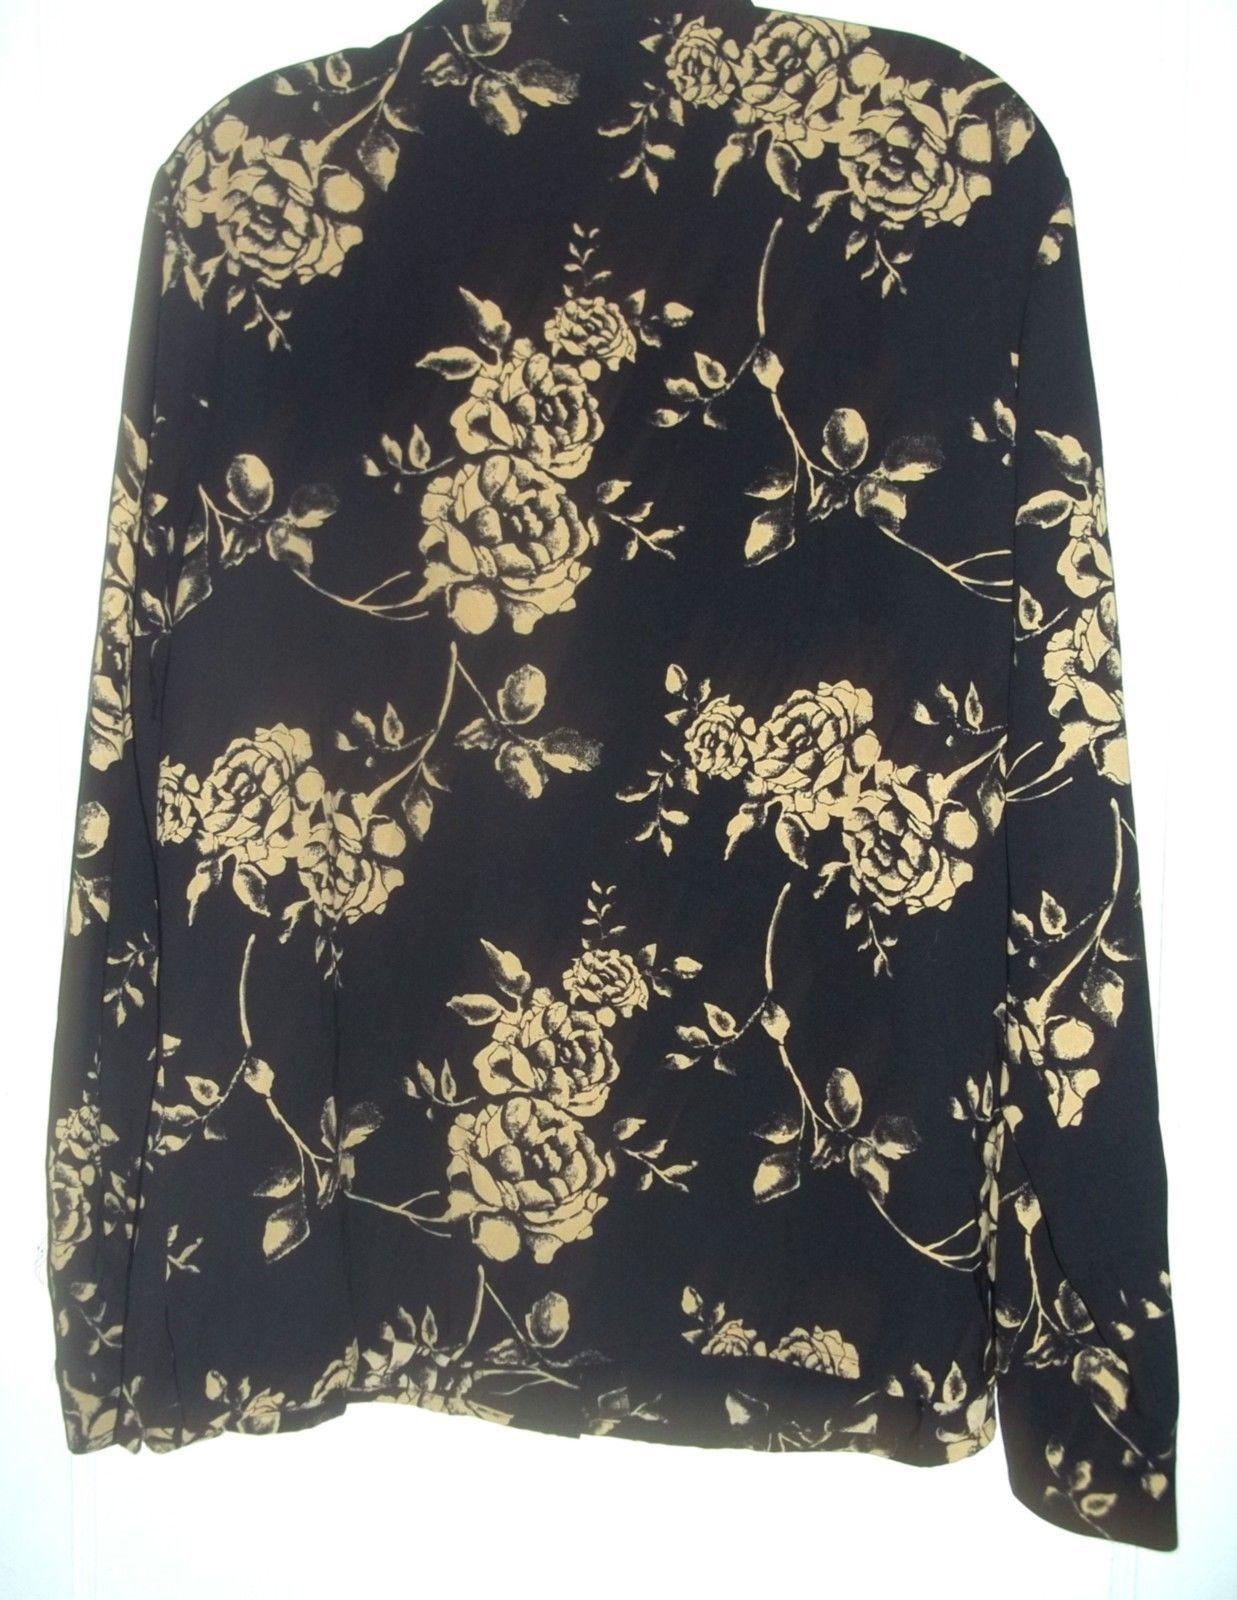 a3d84b55d86 Size 18 - Laura Scott Black w Cream Gold Roses Print Silk-feel Blouse